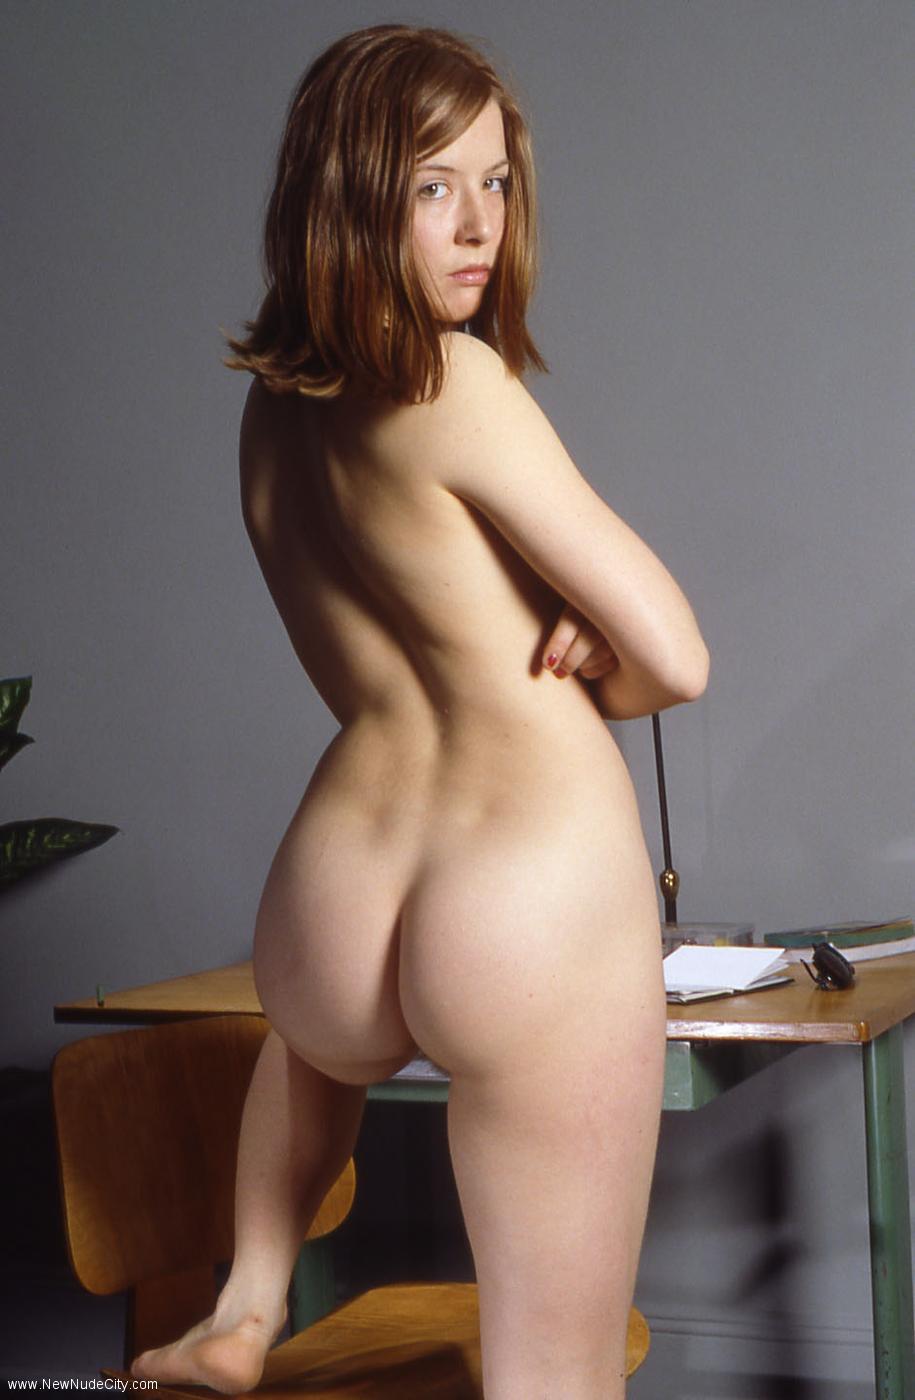 Adrienne new nude city